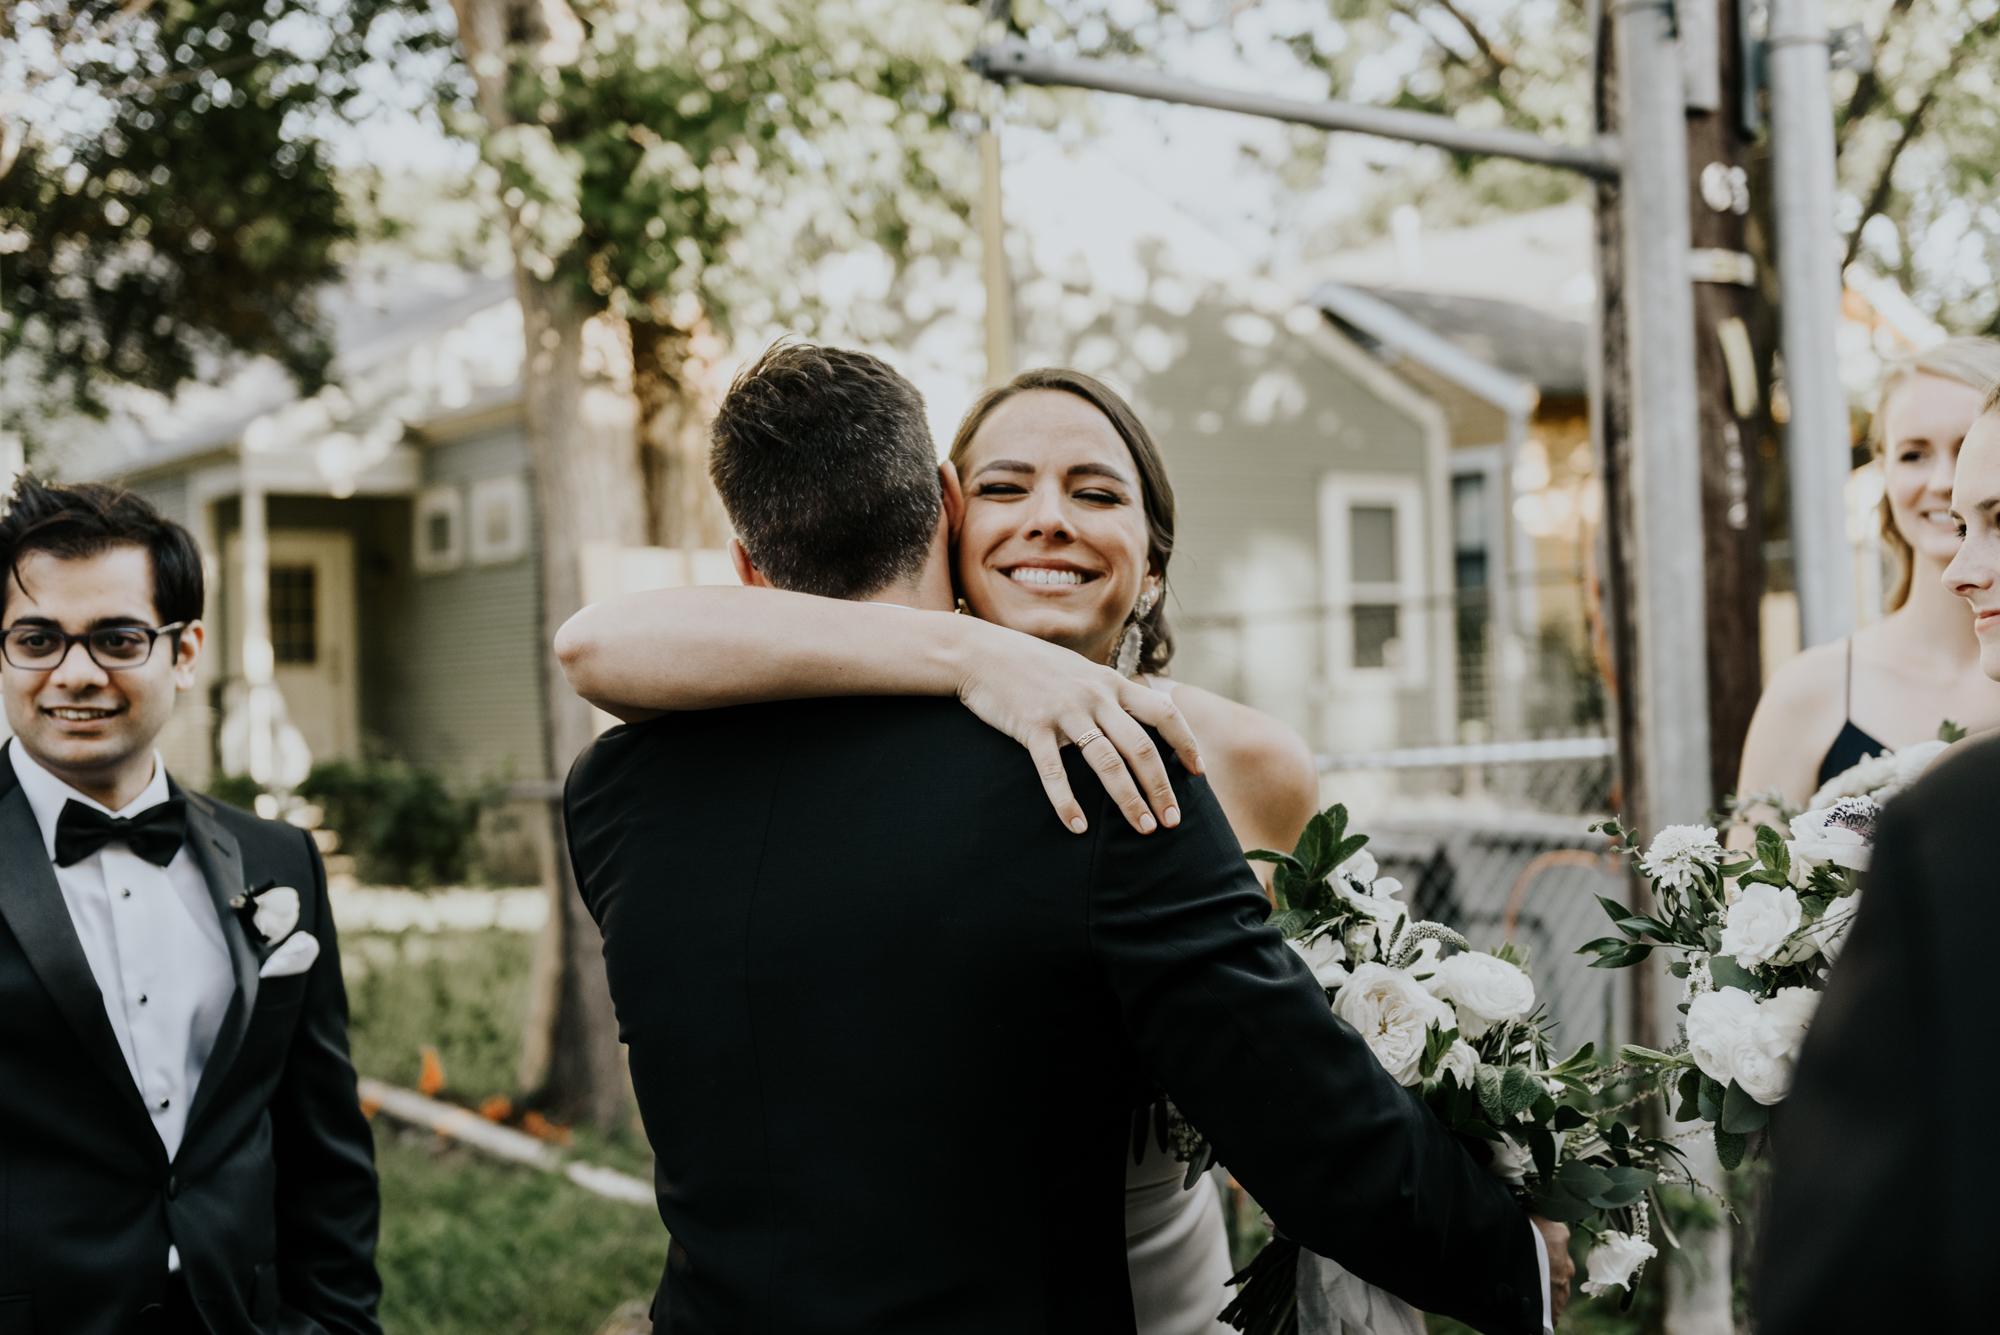 Intimate Wedding Day Ceremony Photos in Austin, Texas